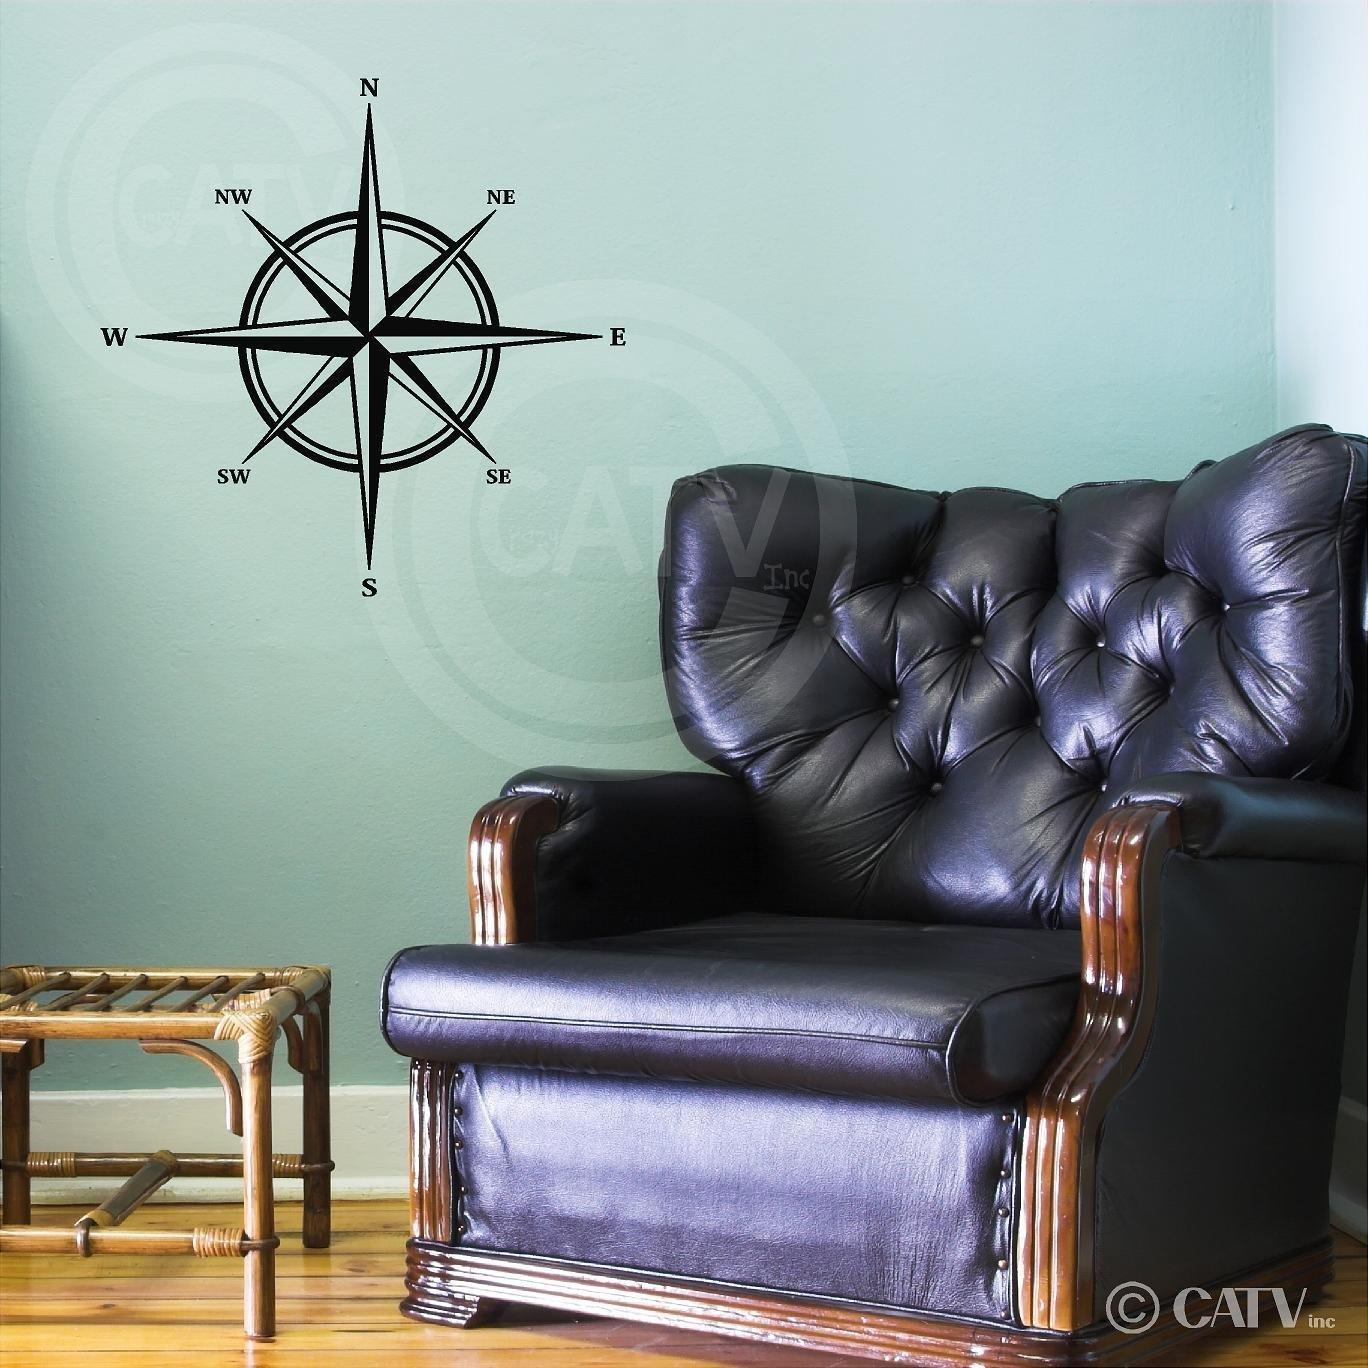 Compass vinyl wall decal sticker Wall Sayings Vinyl Lettering 22H x 22W, Metallic Bronze